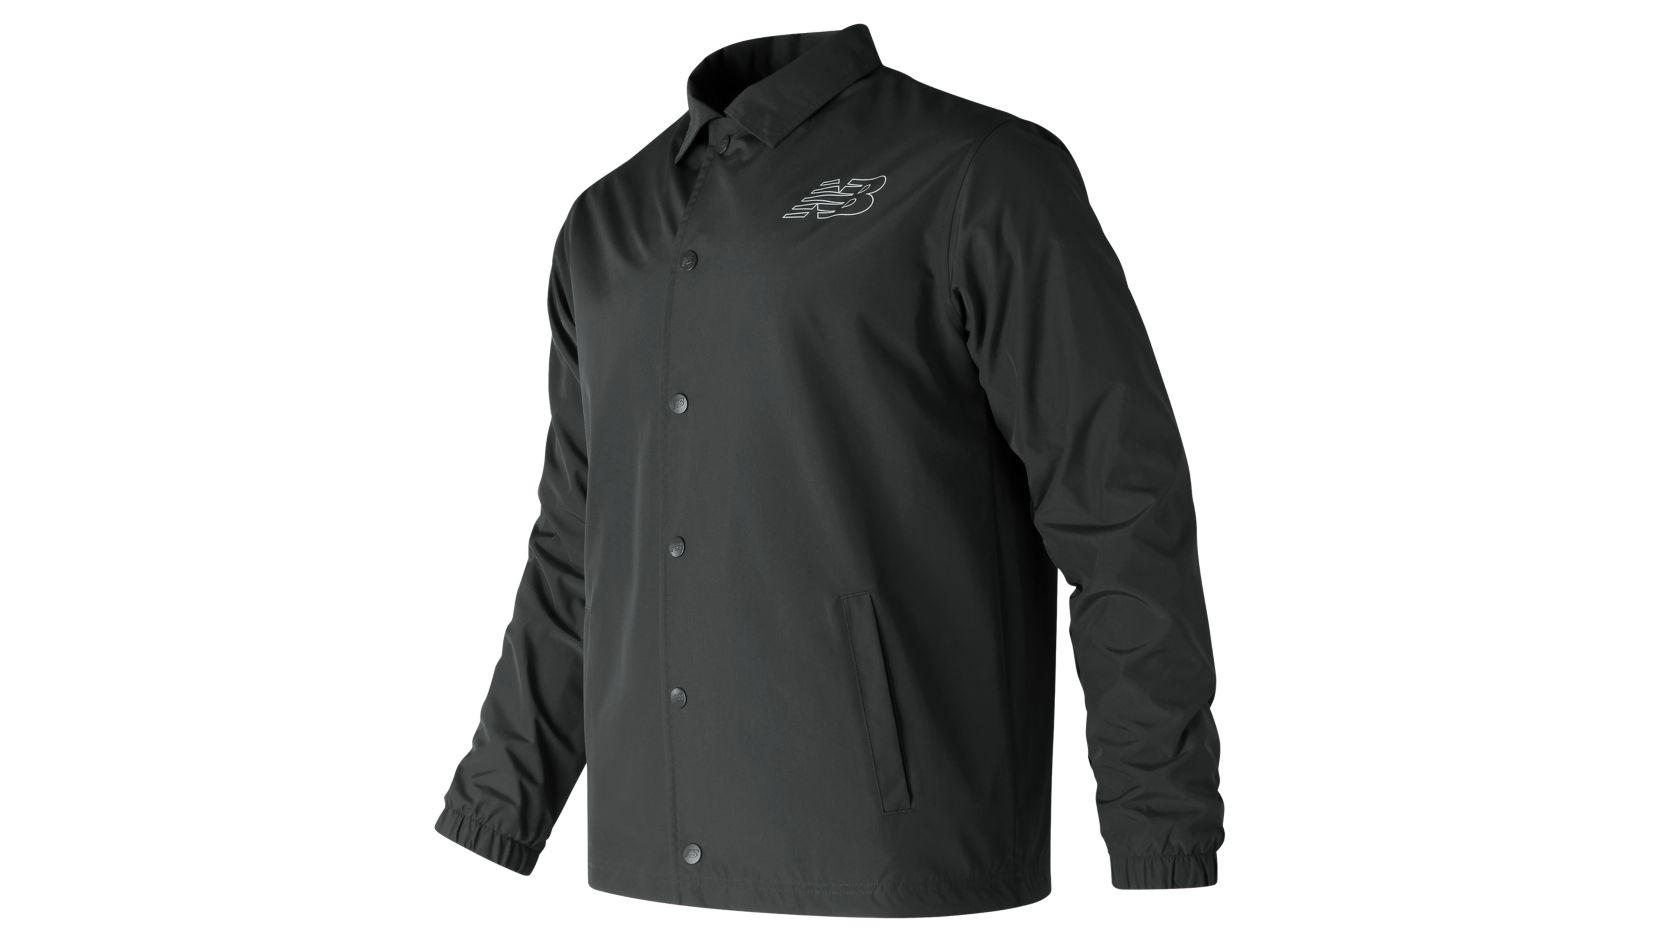 Classic Coaches Jacket - Men's 71529 - Jackets, Lifestyle - New ...